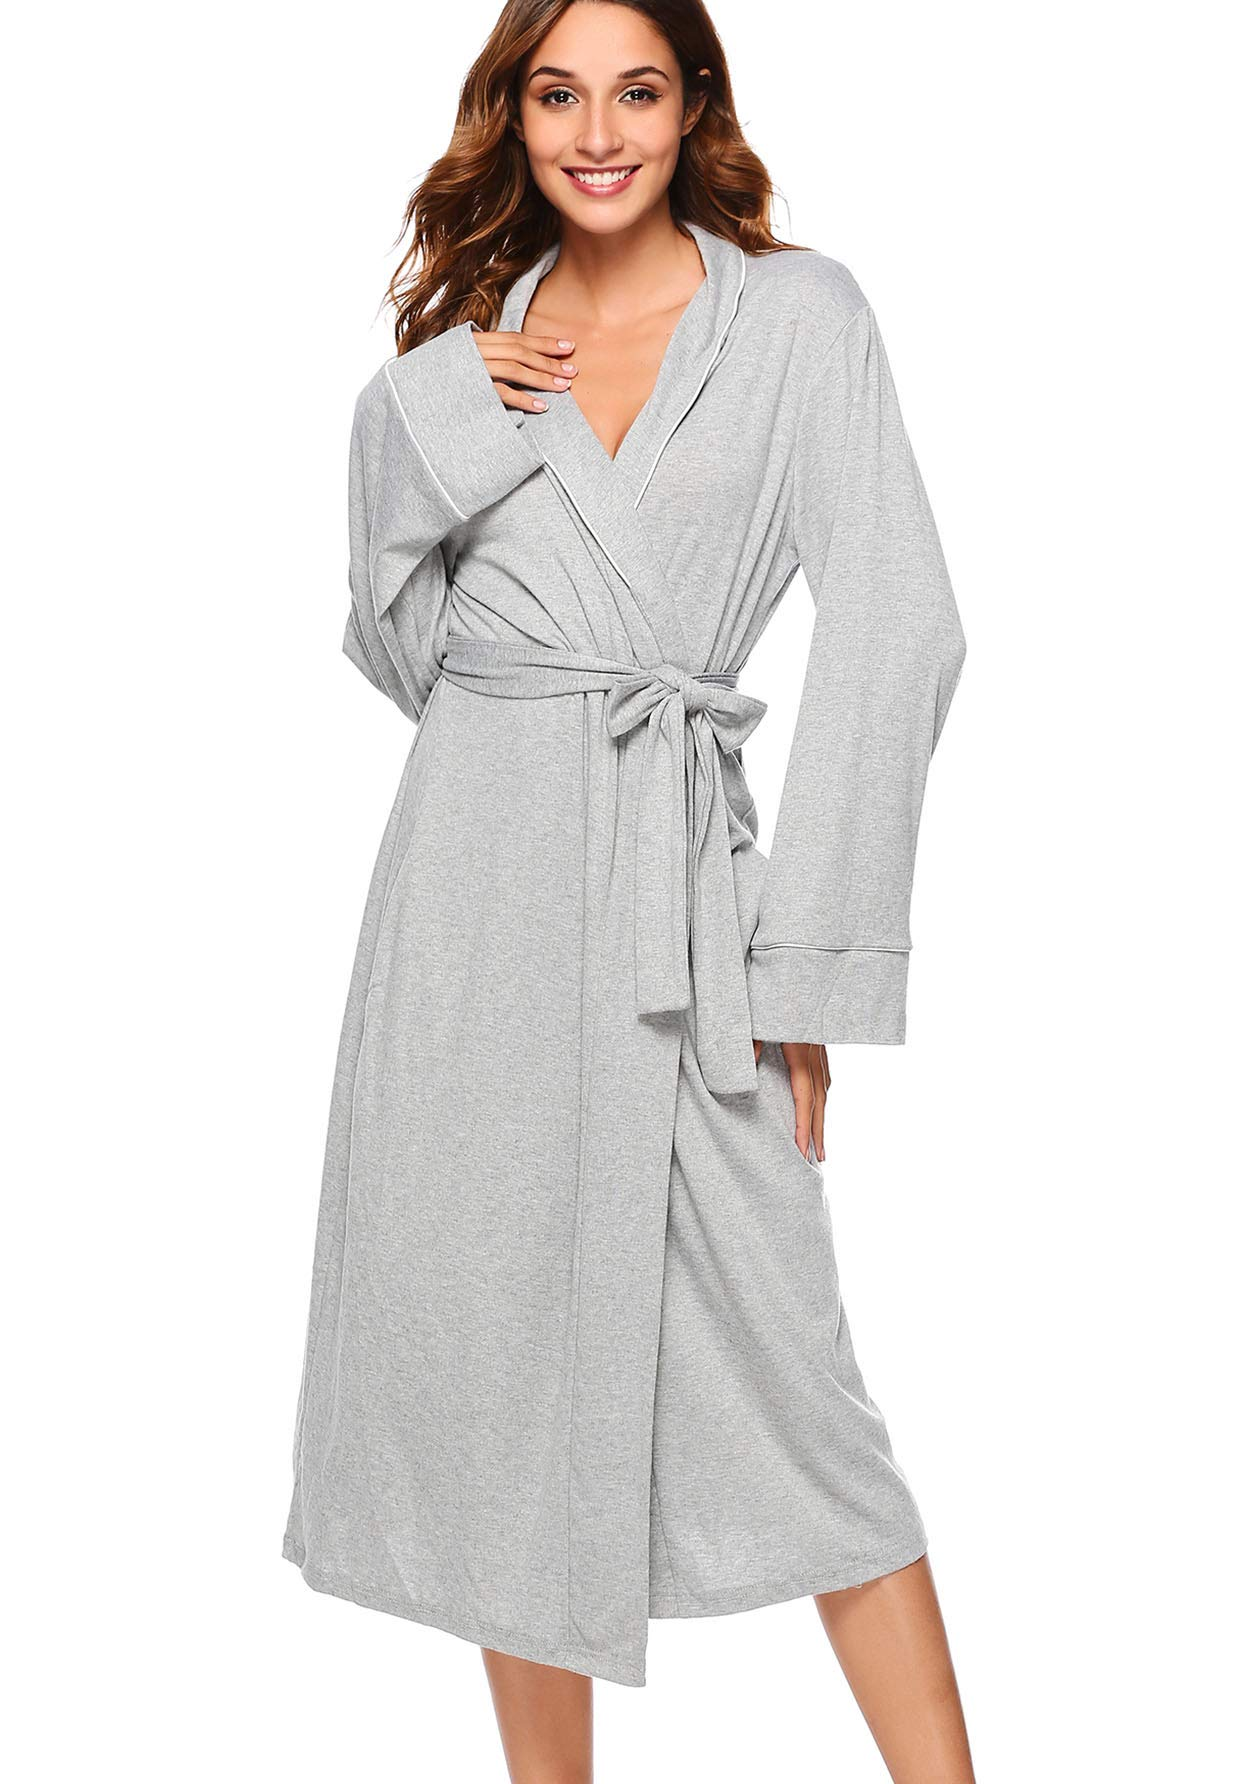 ETOSELL Women's Nightgowns Long Sleeves Nightshirt Soft Sleepwear